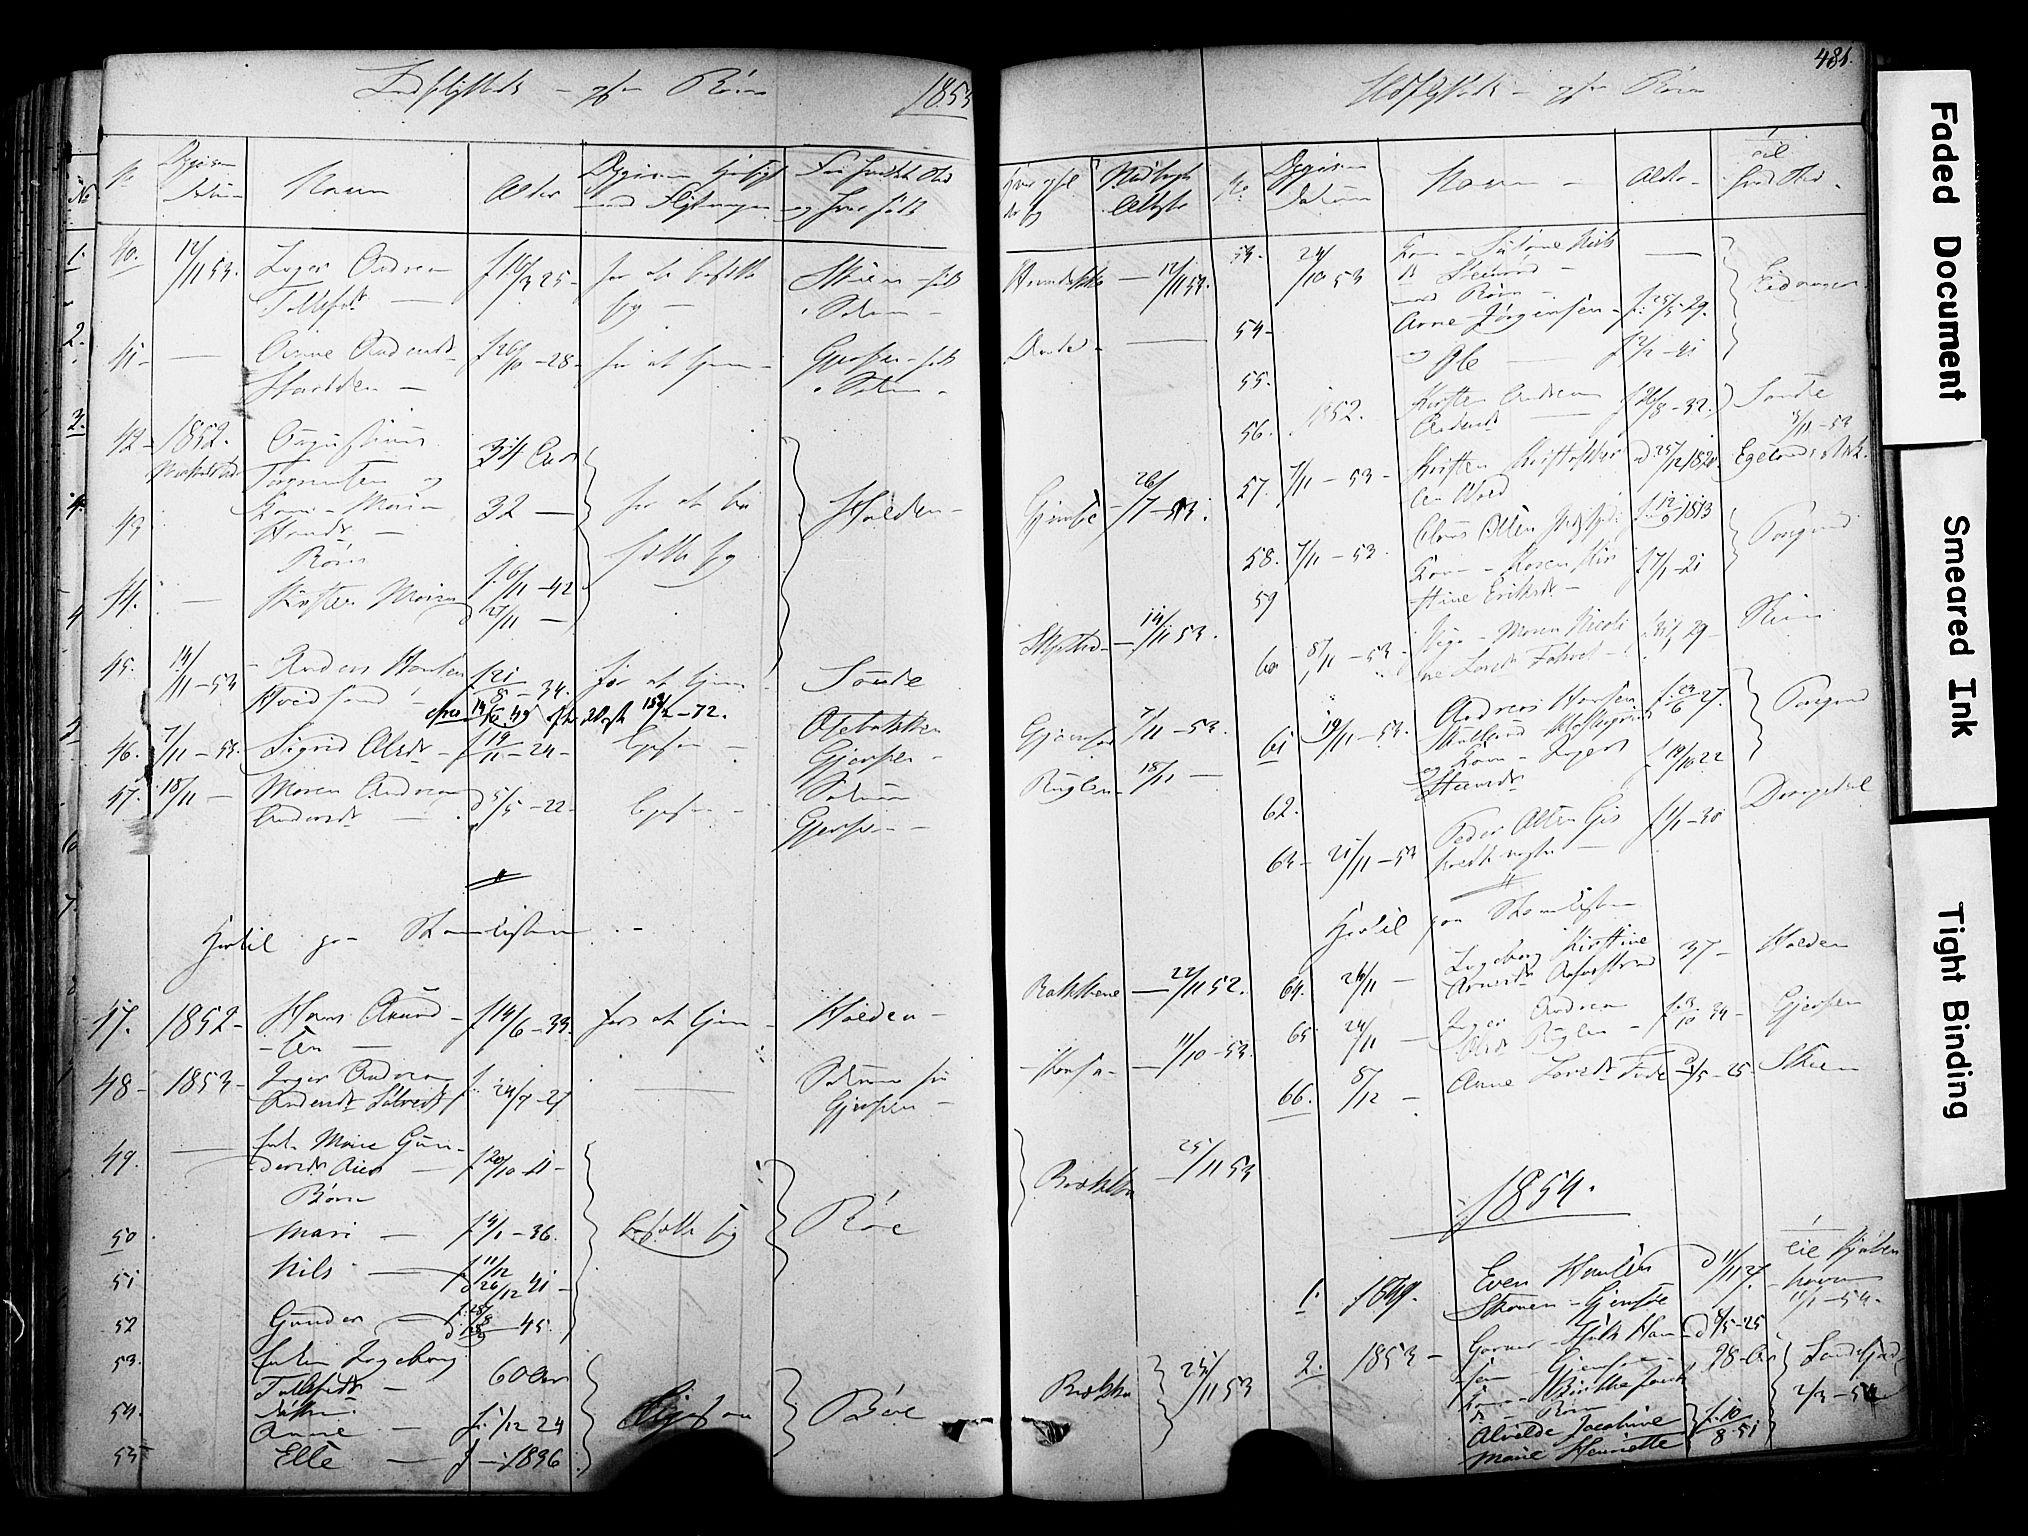 SAKO, Solum kirkebøker, F/Fa/L0006: Ministerialbok nr. I 6, 1844-1855, s. 481